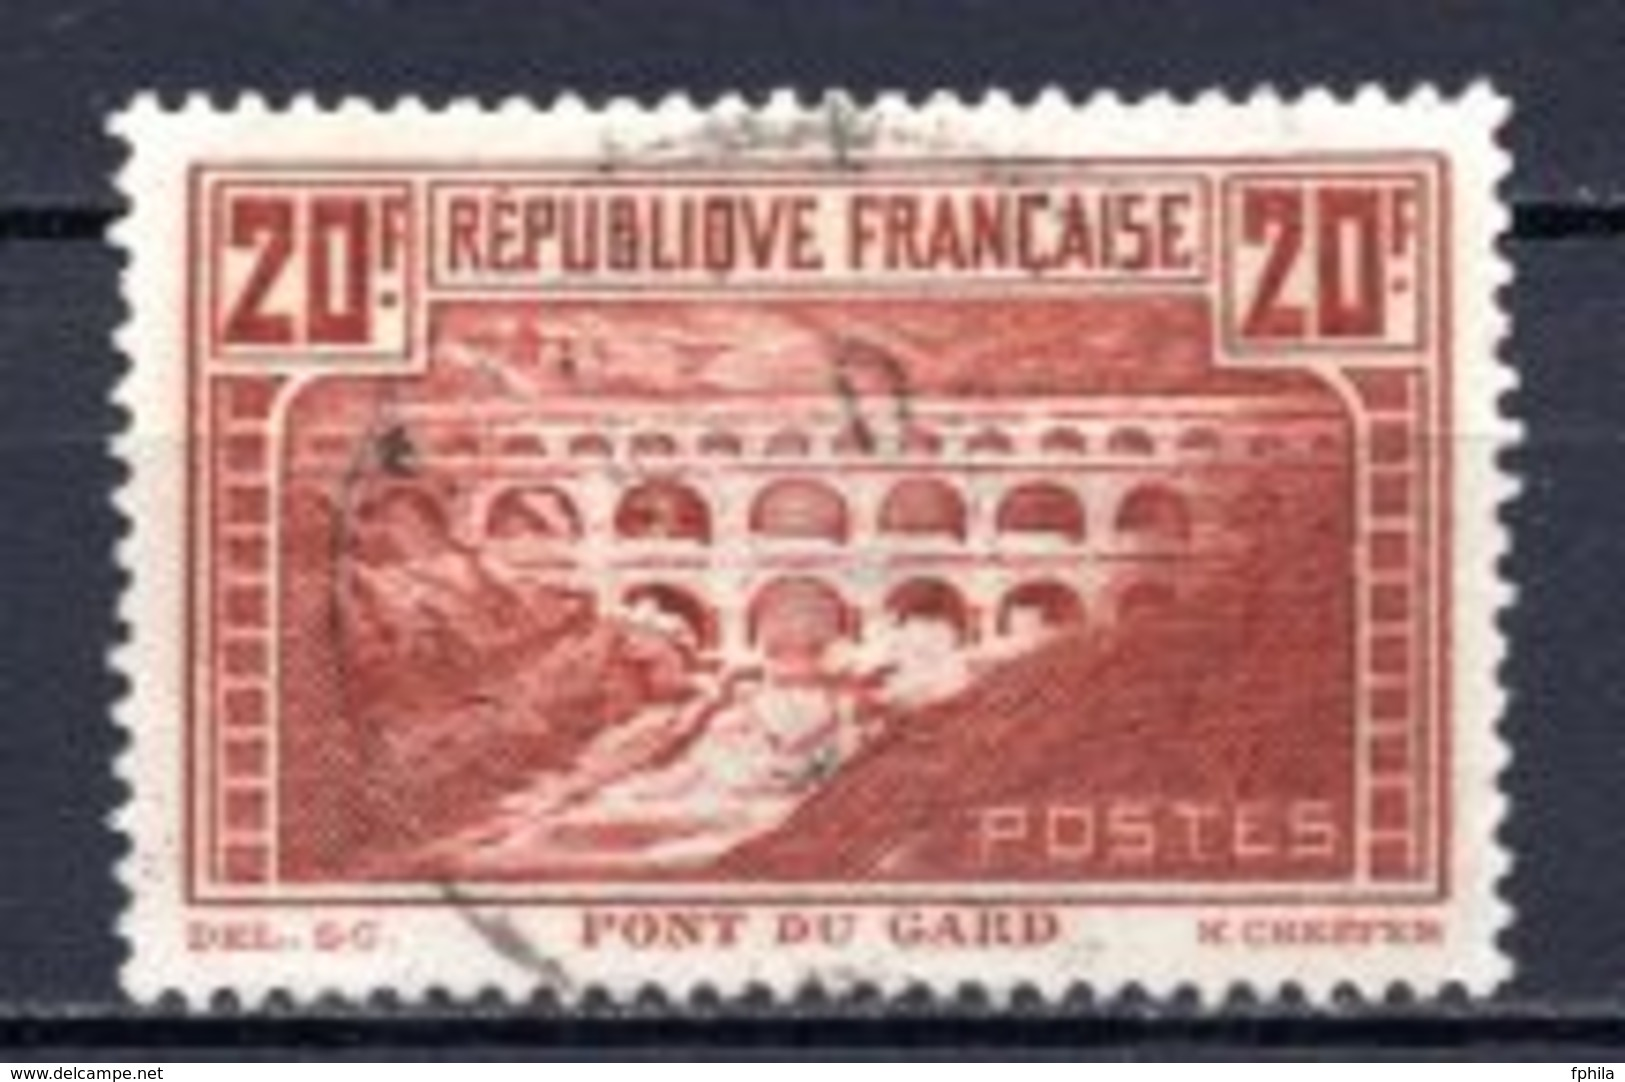 1931 FRANCE 20FR. DEFINITIVE PERF. 13 MICHEL: 242C USED - Gebraucht